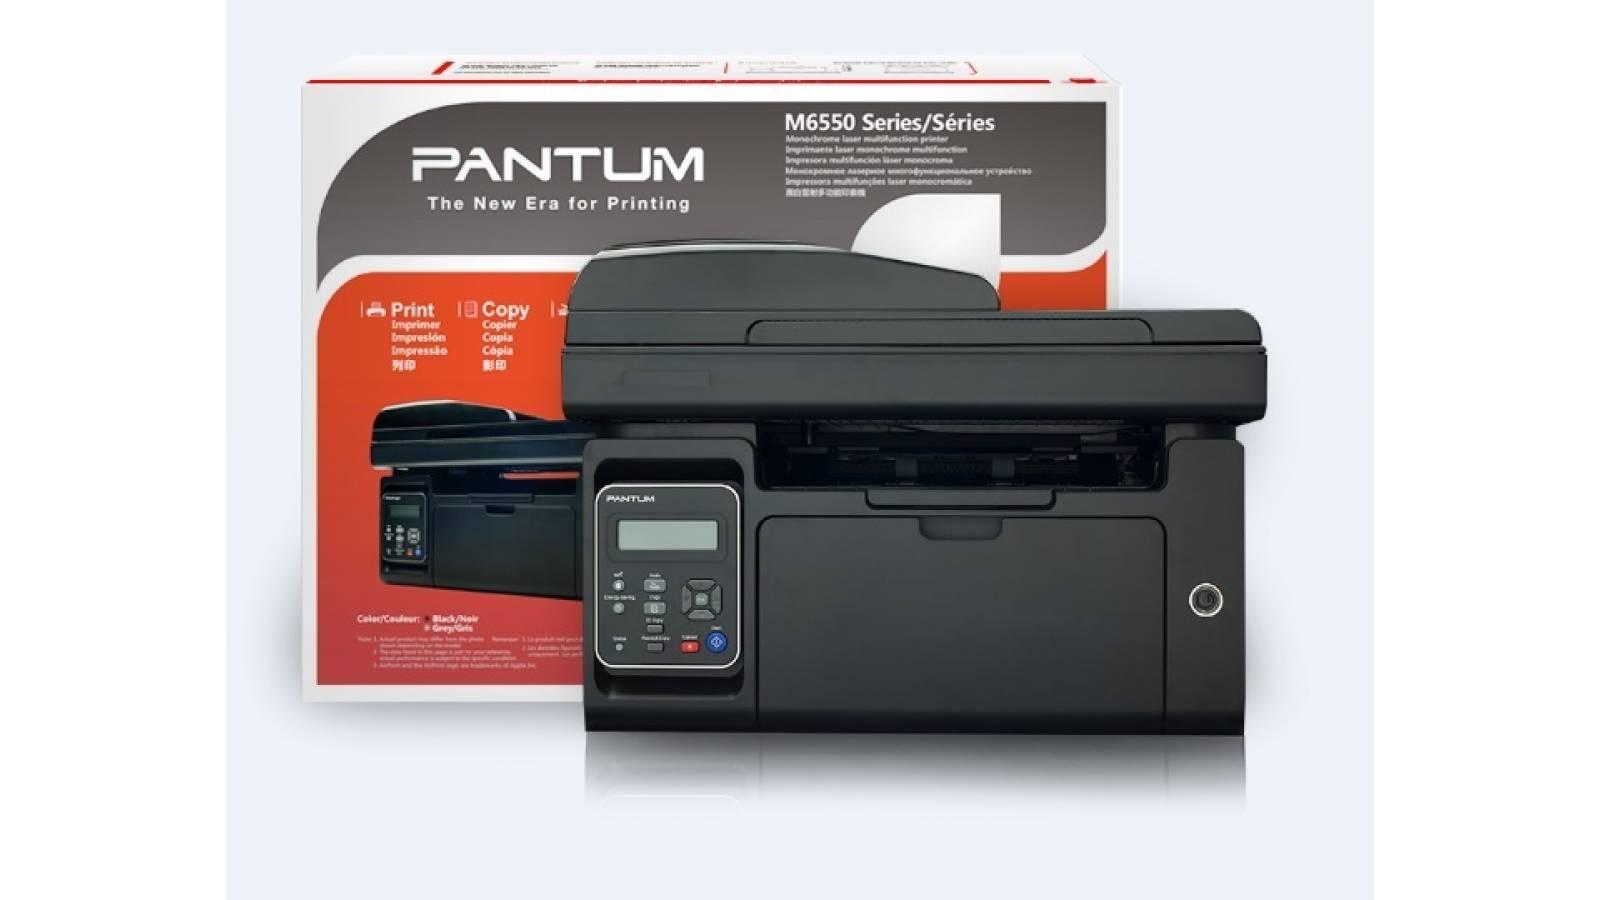 Multifuncional láser monocromática Pantum M6550NW